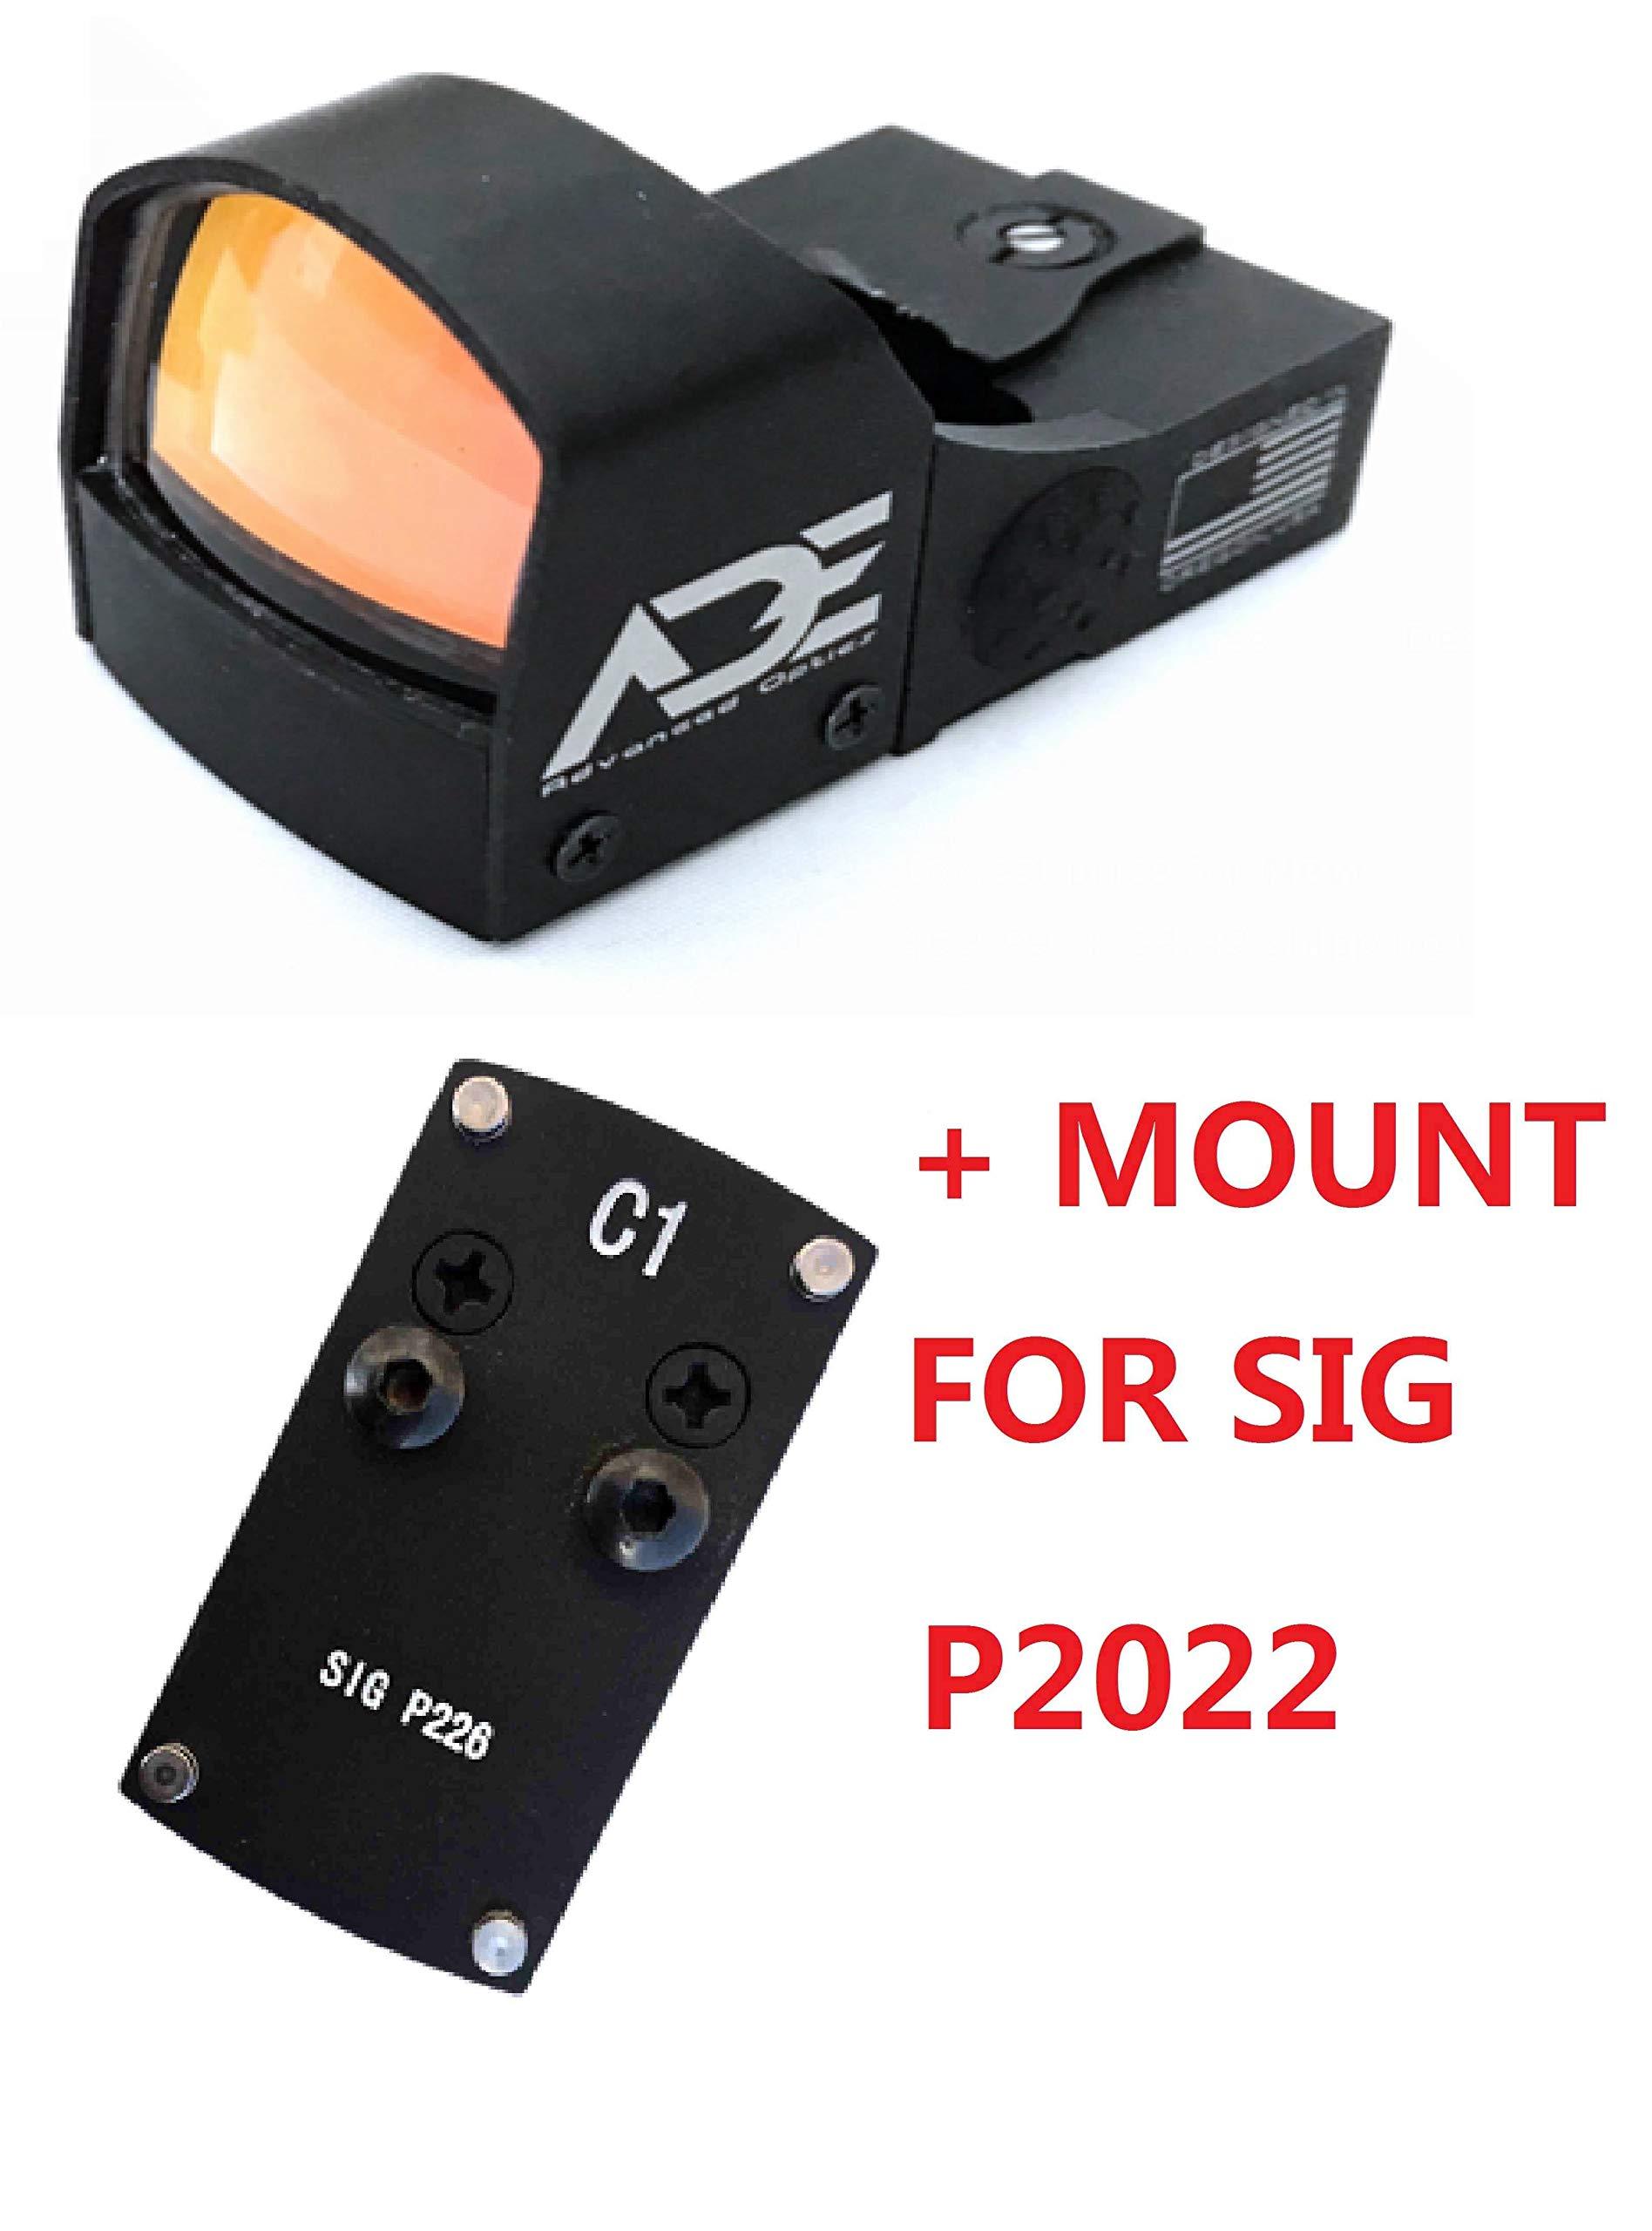 Ade Advanced Optics Compact RD3-009 Red Dot Reflex Sight for Sig Sauer P226 P2022 Pistol by Ade Advanced Optics